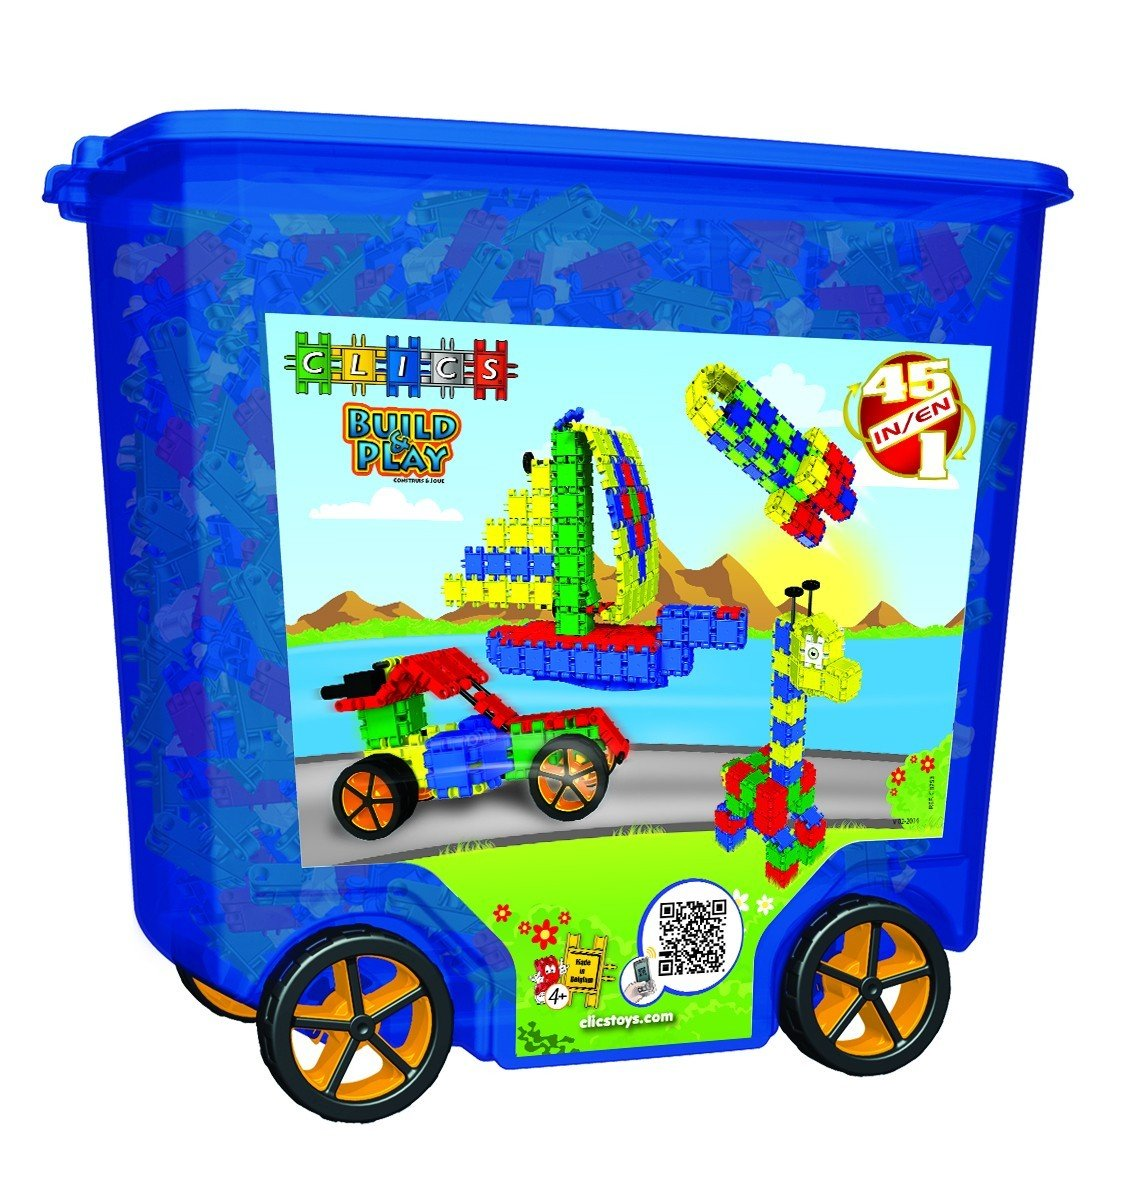 BIG Wheels Clics Rollerbox Building Toy 700 Pieces